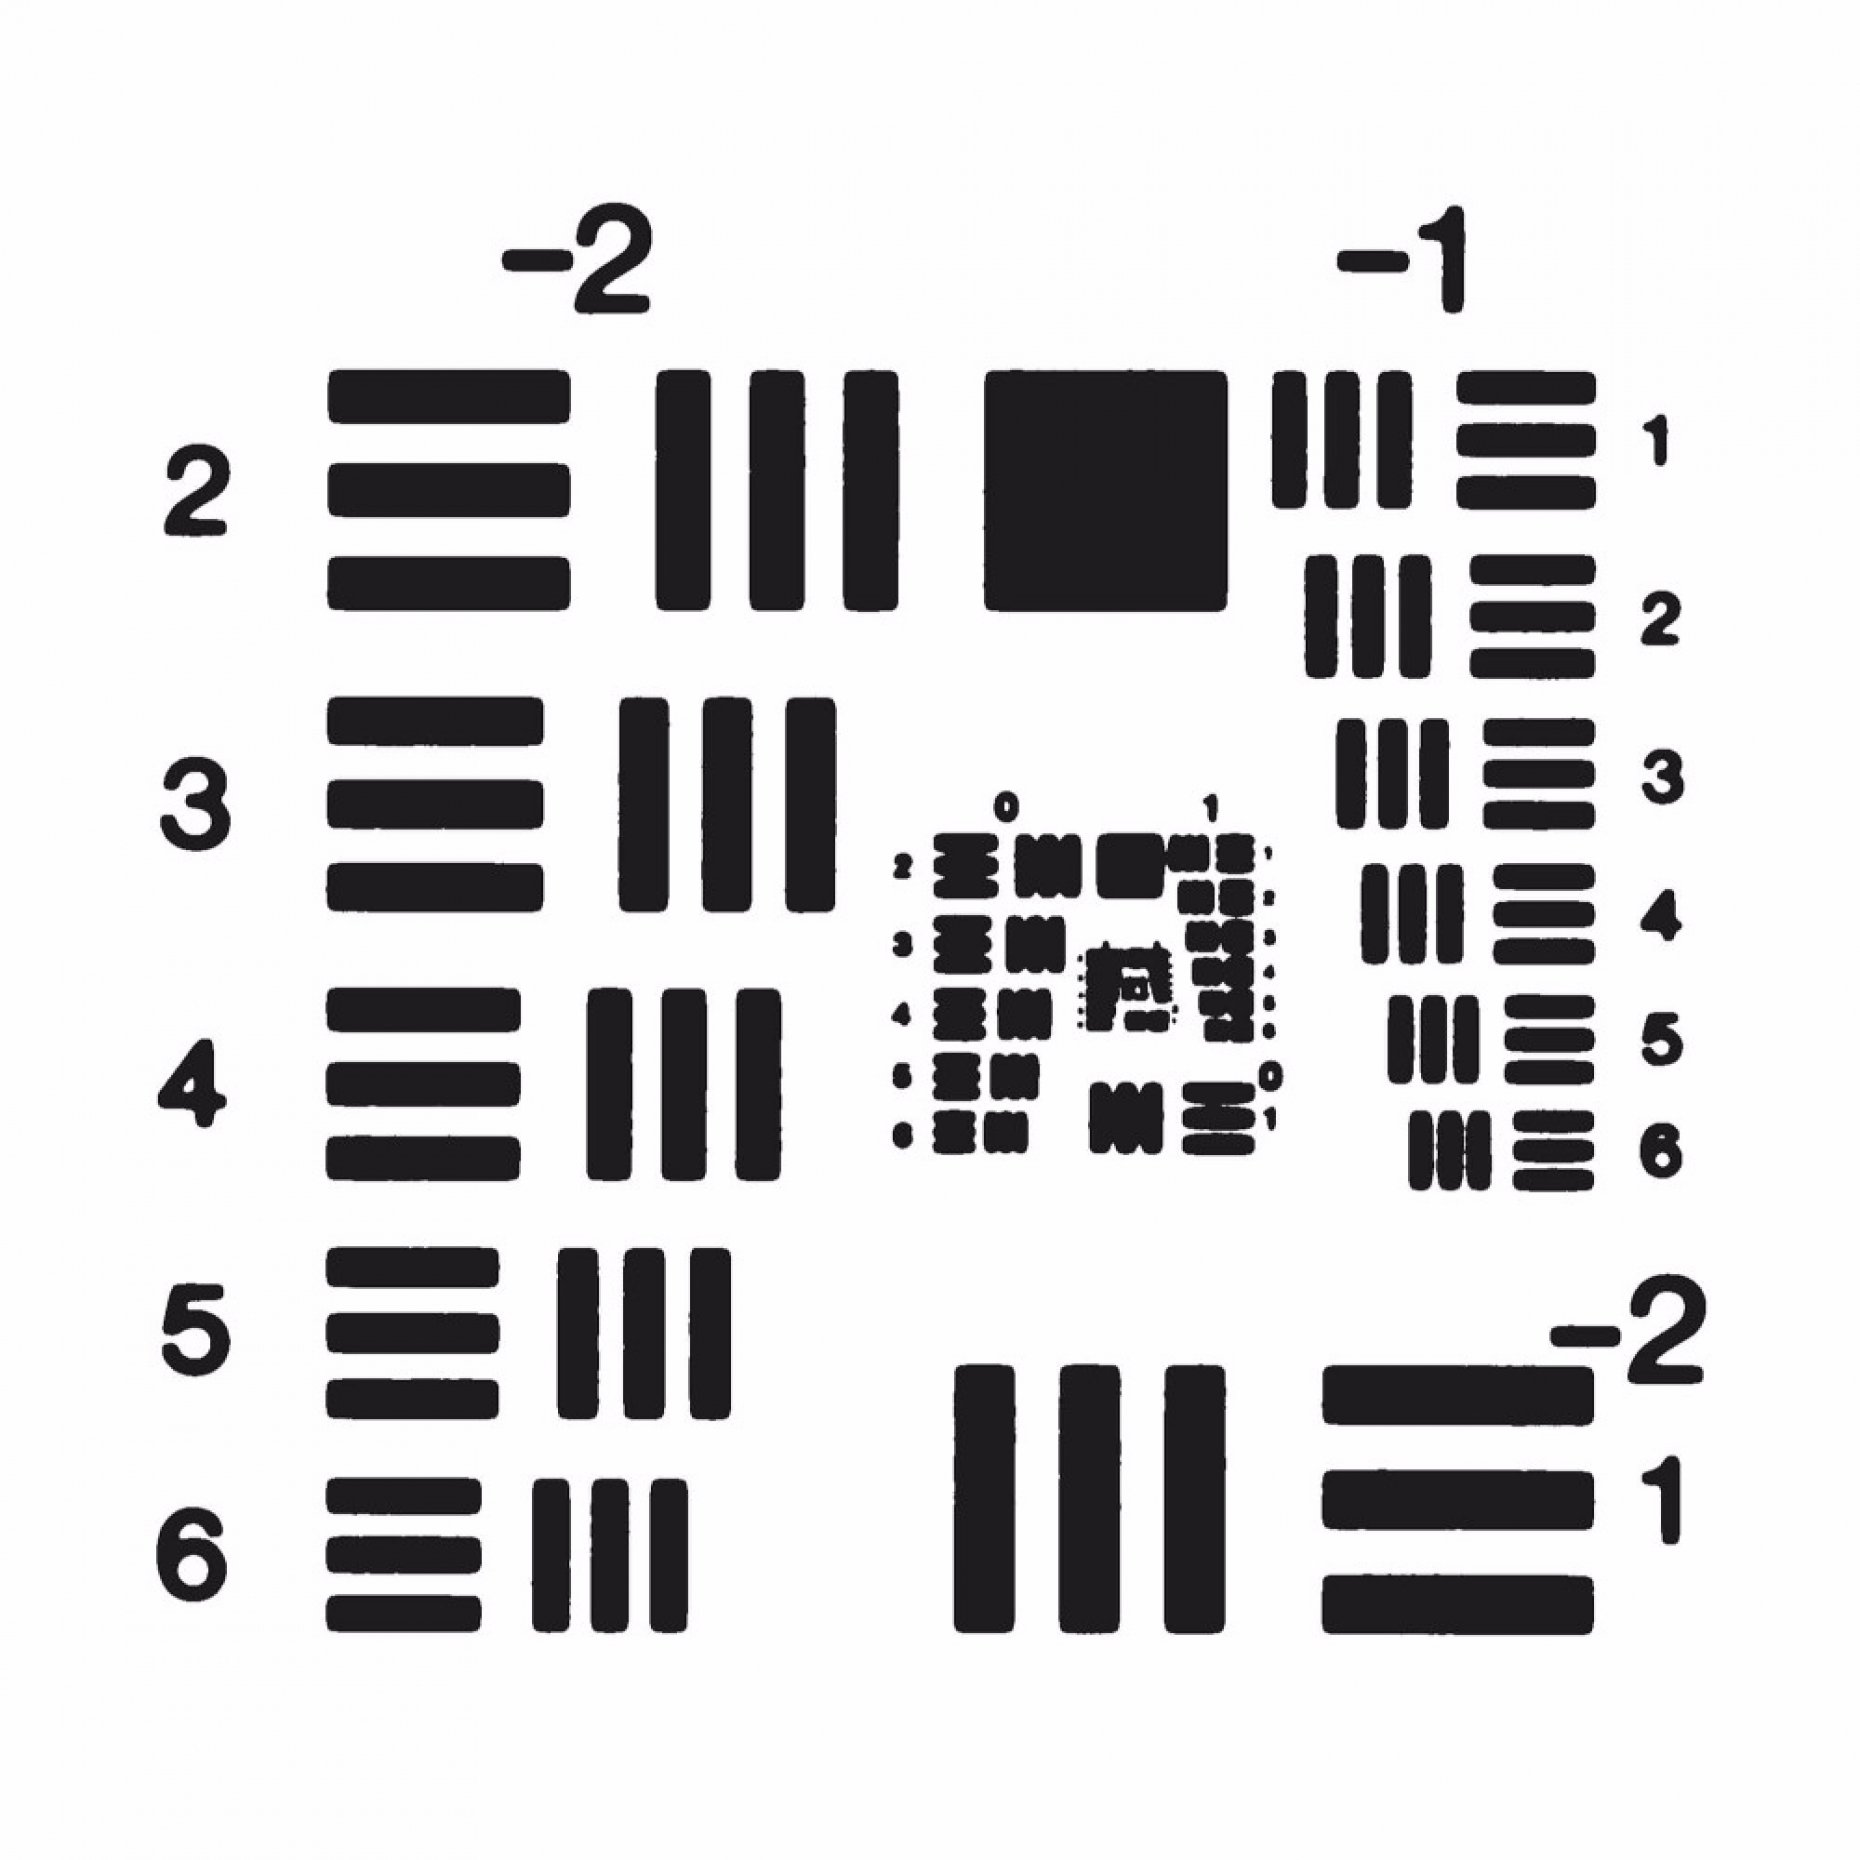 R71 USAF Positive Test Chart Group -2/7 Element 1/6